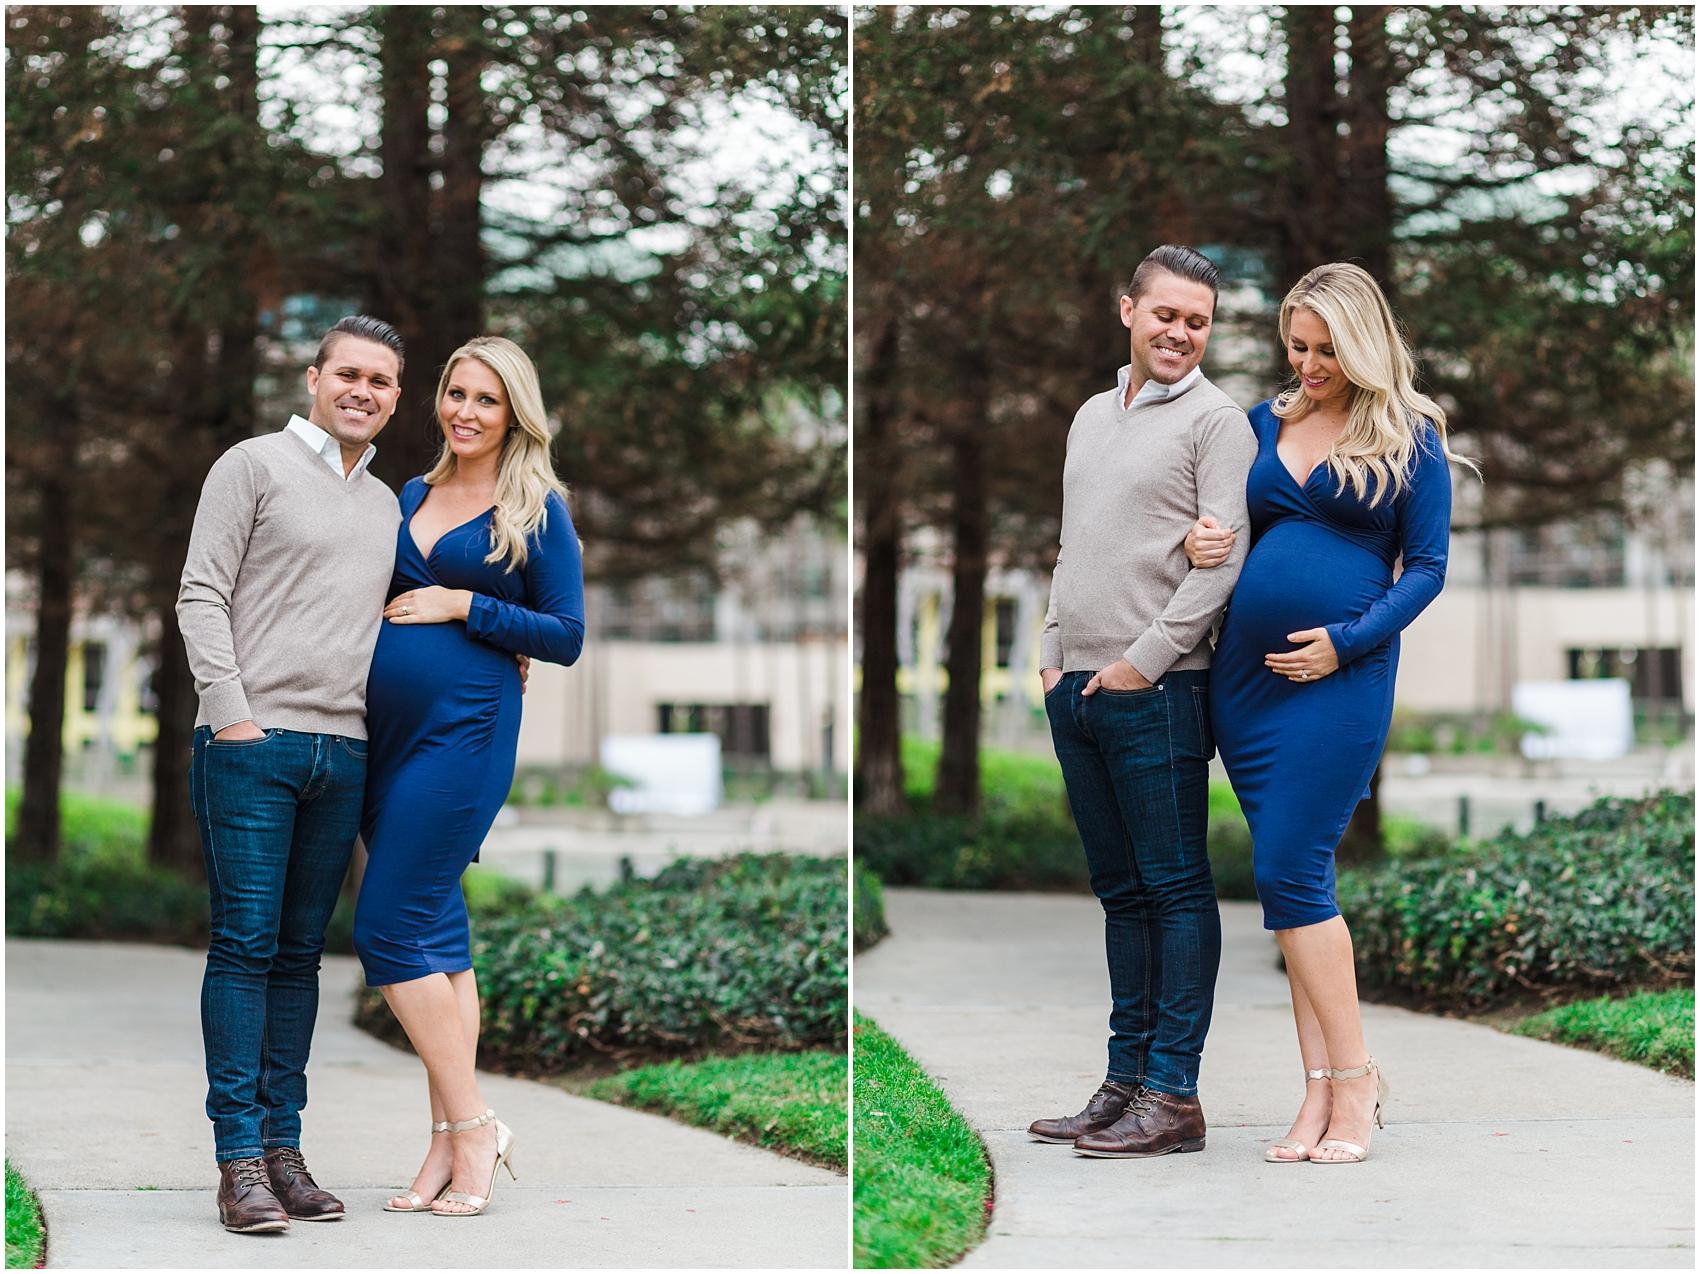 Shawntel and Aaron Maternity-0126.jpg